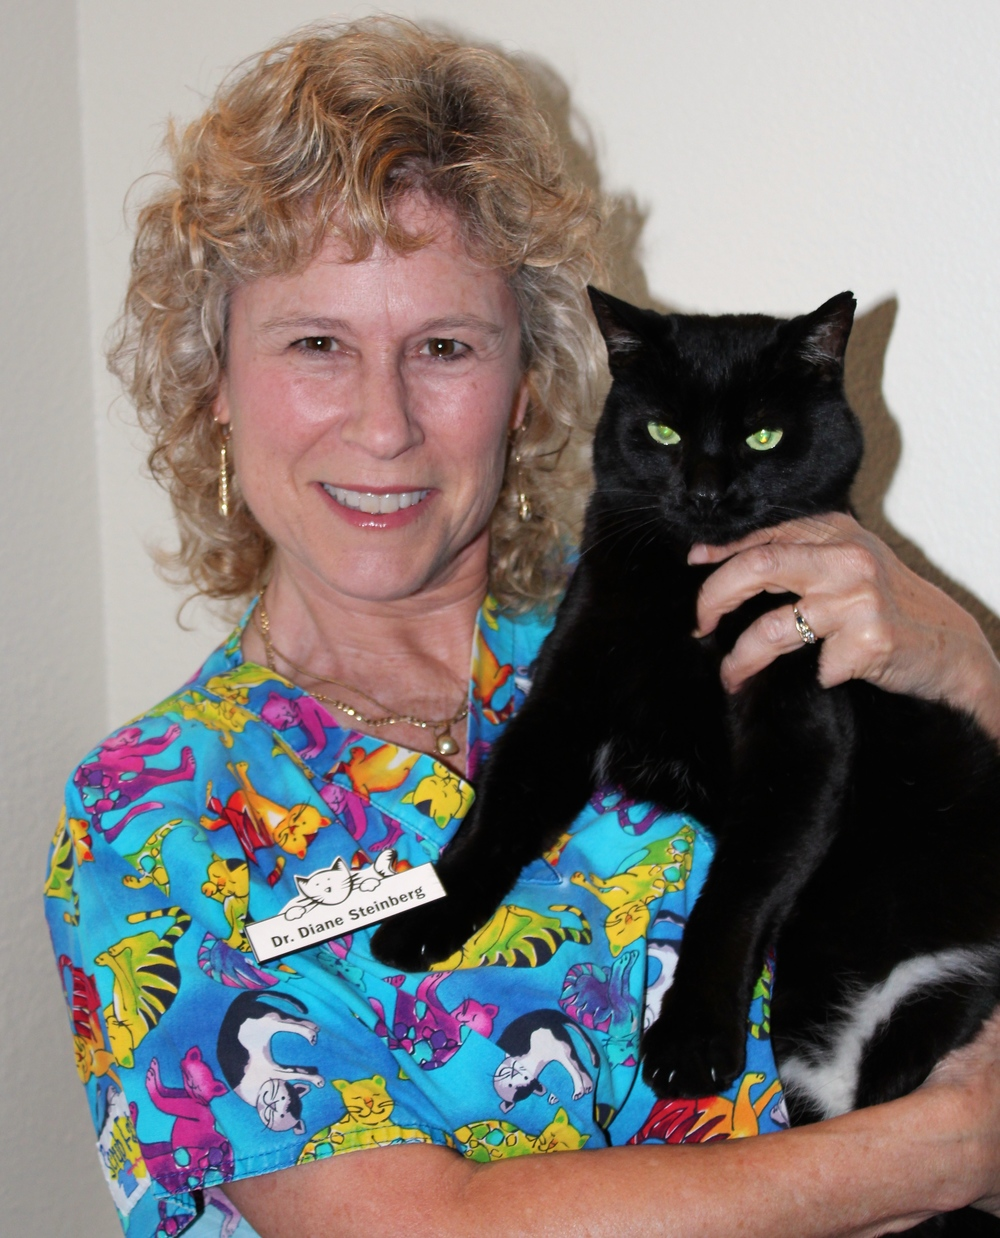 Diane Steinberg, DVM, DABVP (Feline)